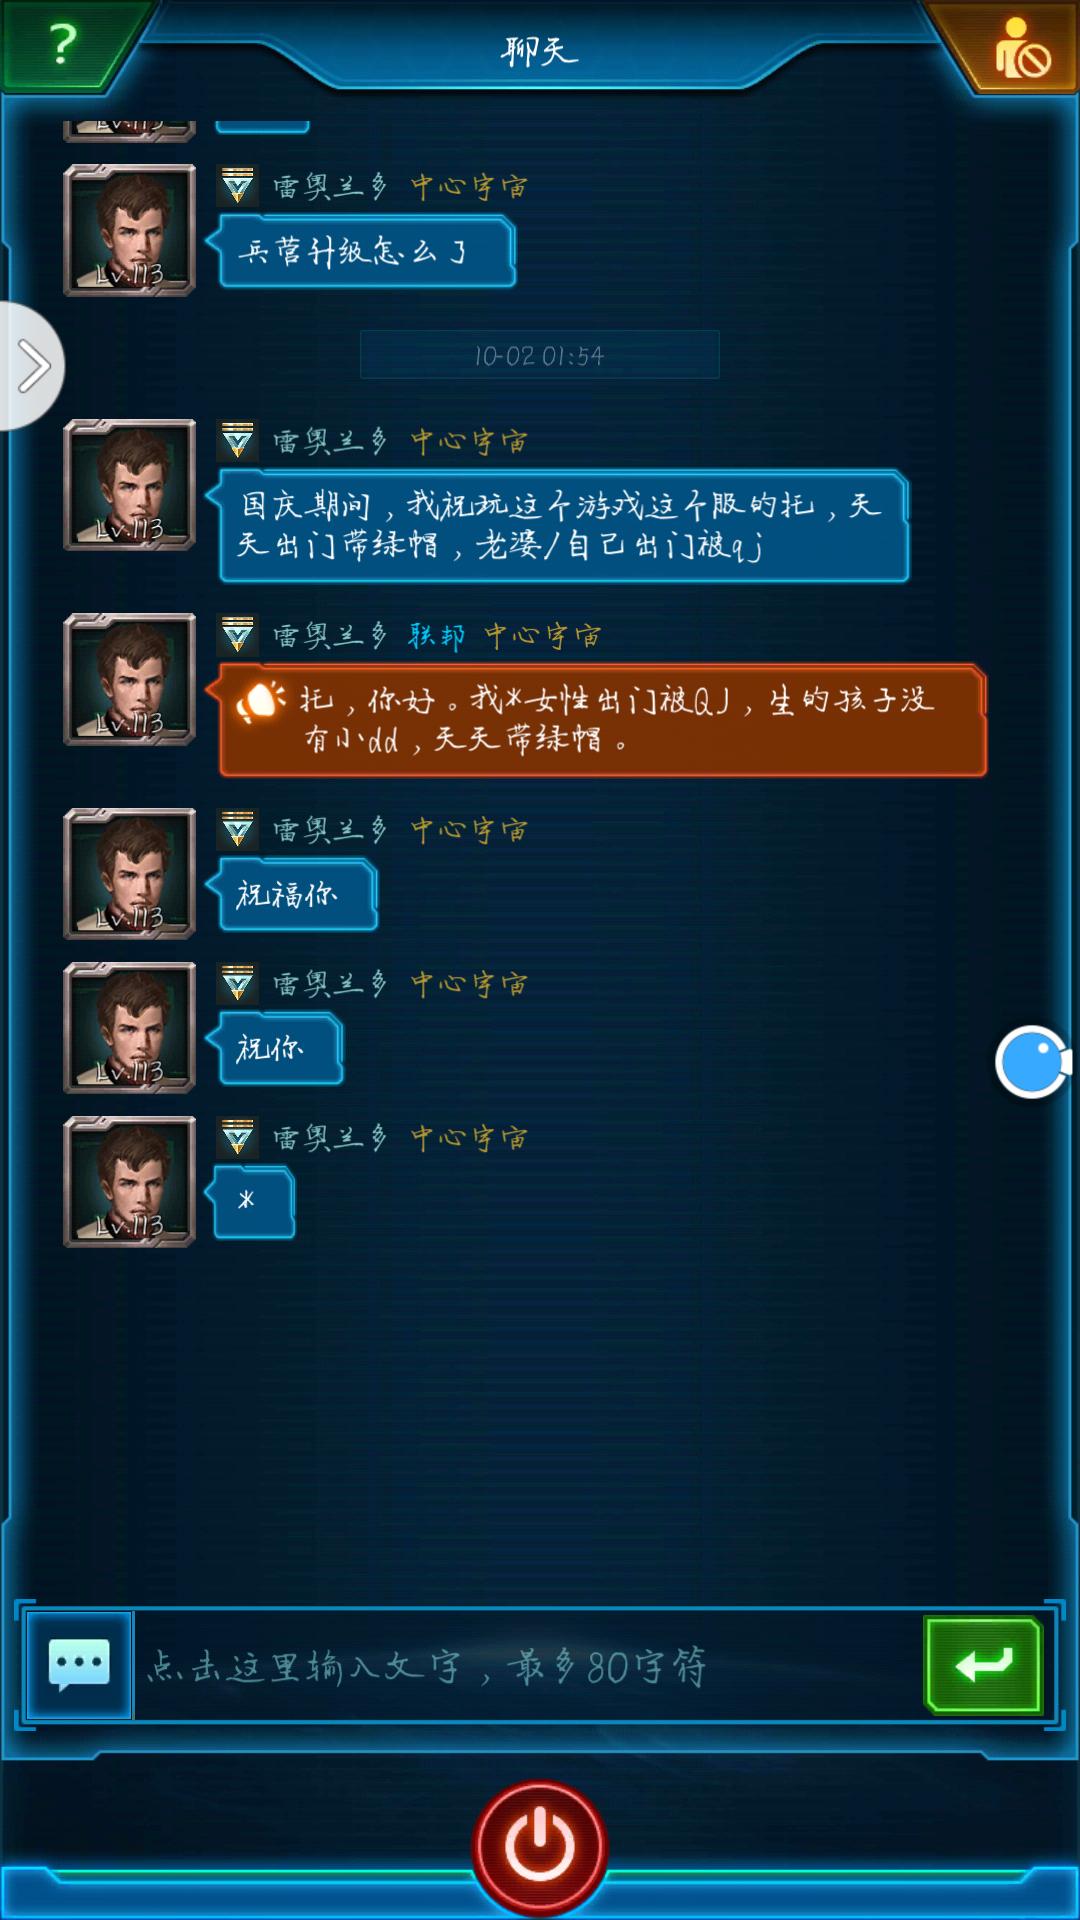 Screenshot_2018-10-02-02-06-53-24.png